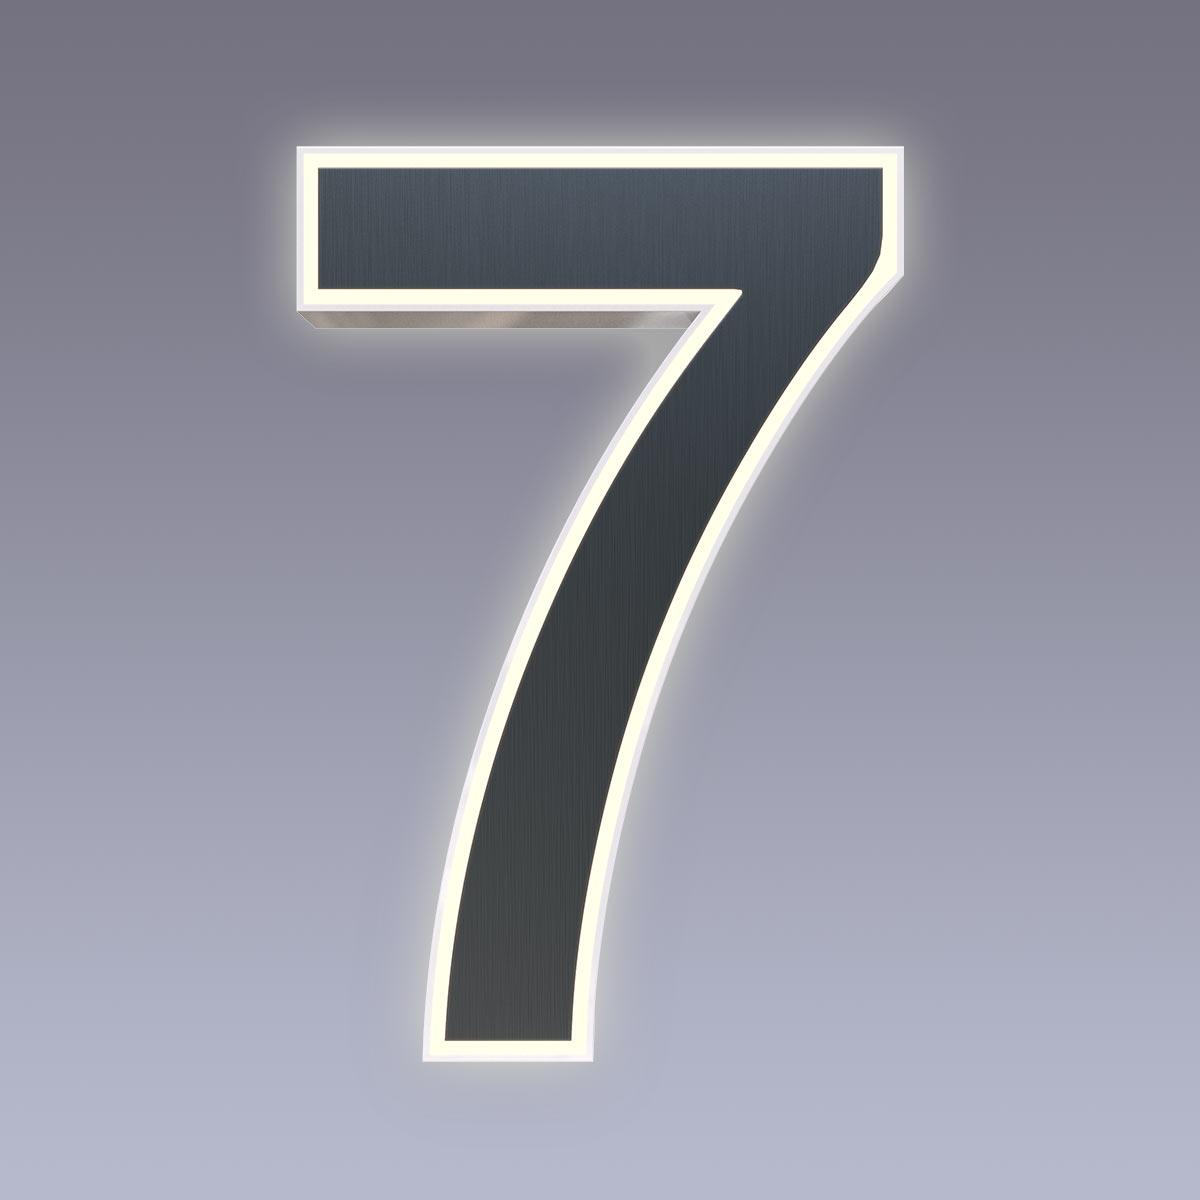 Cover für 15cm Hausnummer 7 Edelstahl anthrazit RAL7016 Arial selbstklebend